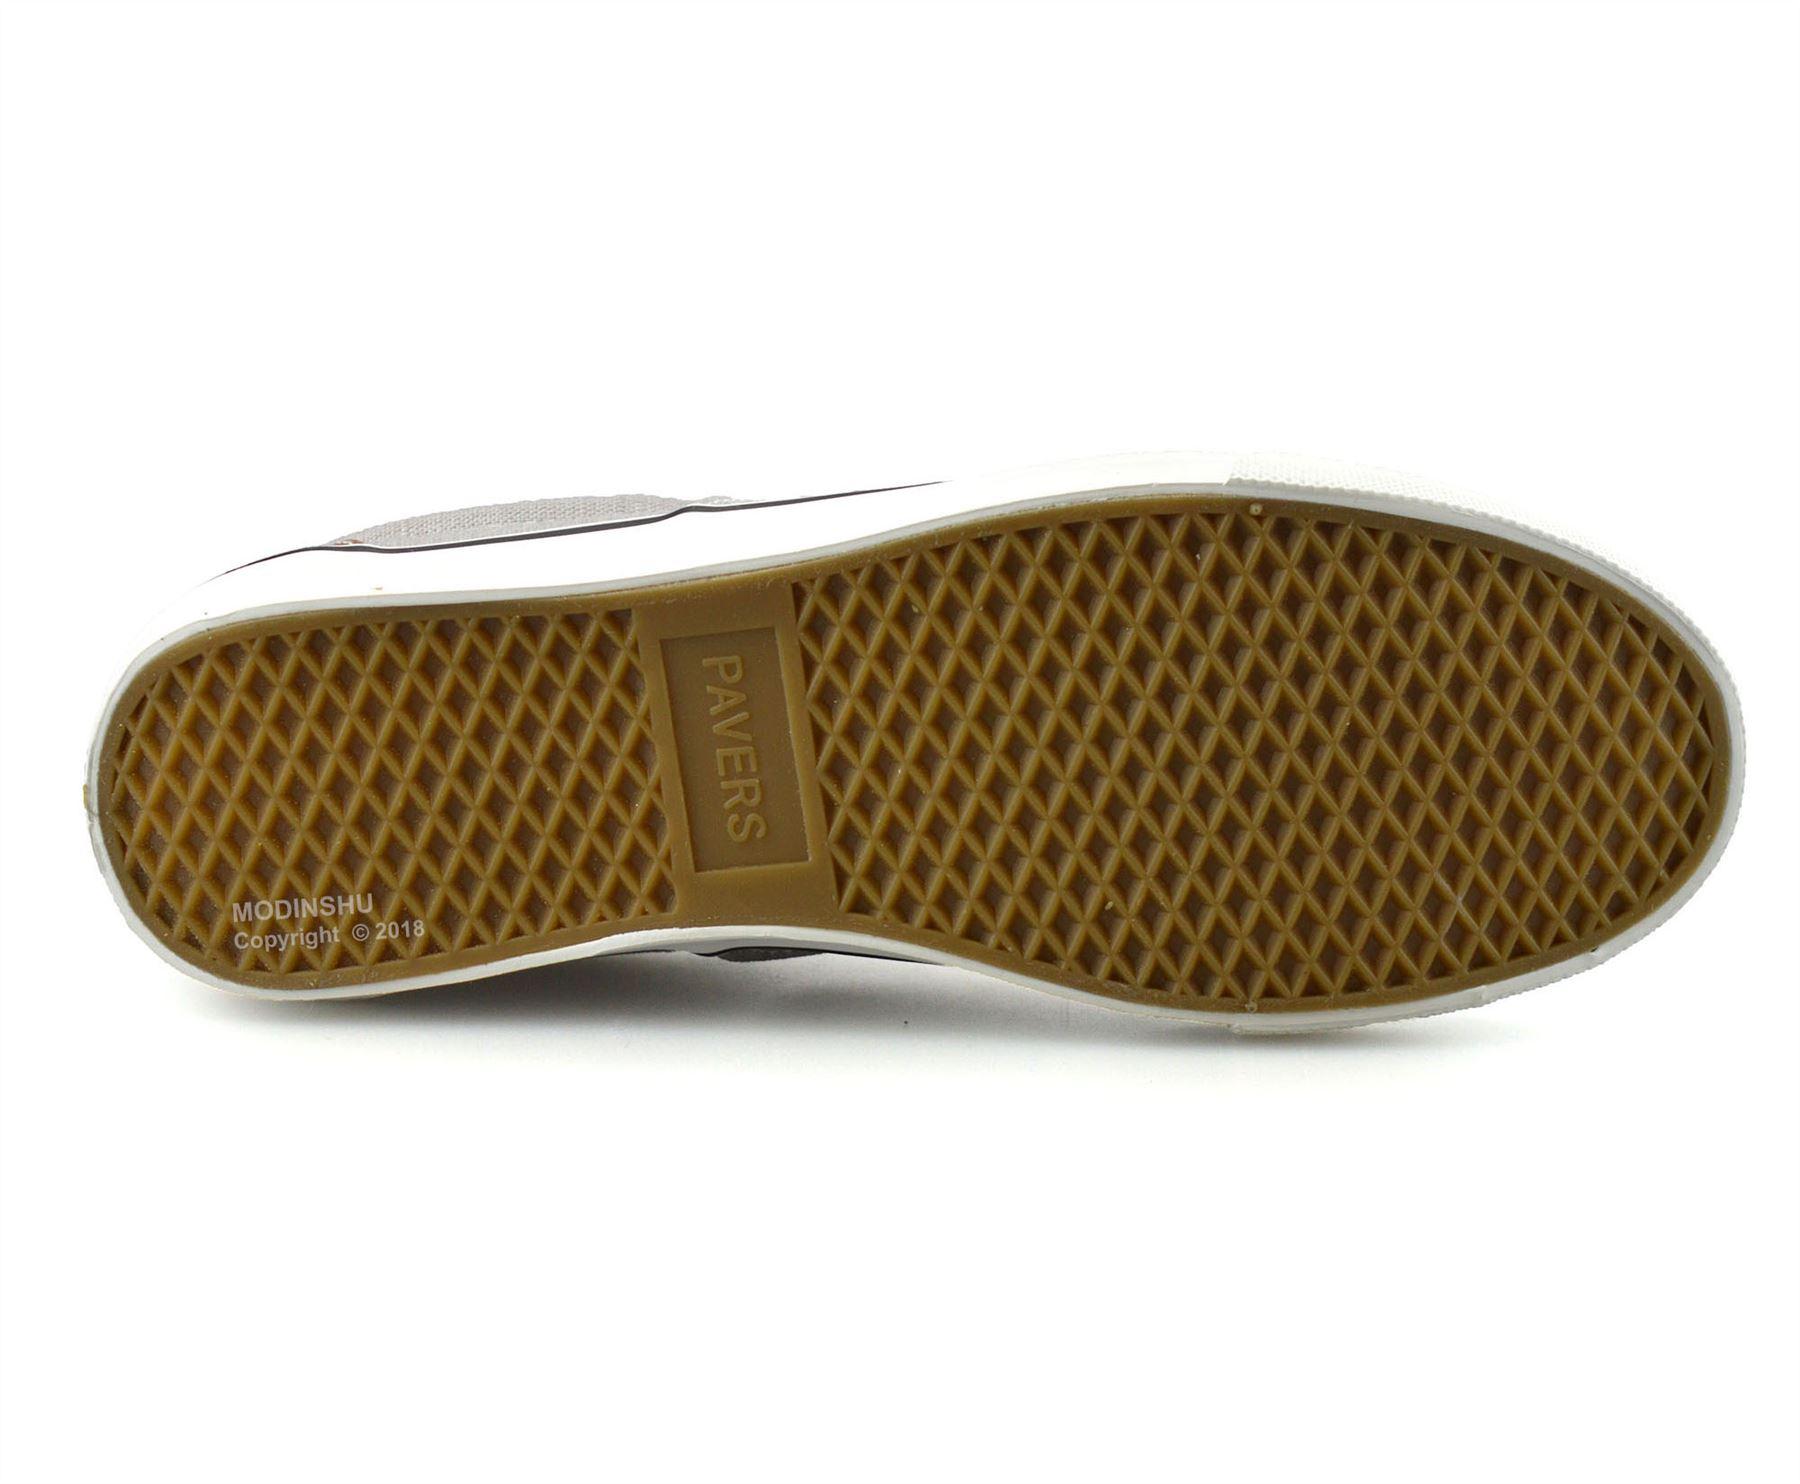 Mens-Casual-Flat-Lace-Up-Canvas-Skate-Pumps-Walking-Plimsolls-Trainers-Shoe-Size thumbnail 20